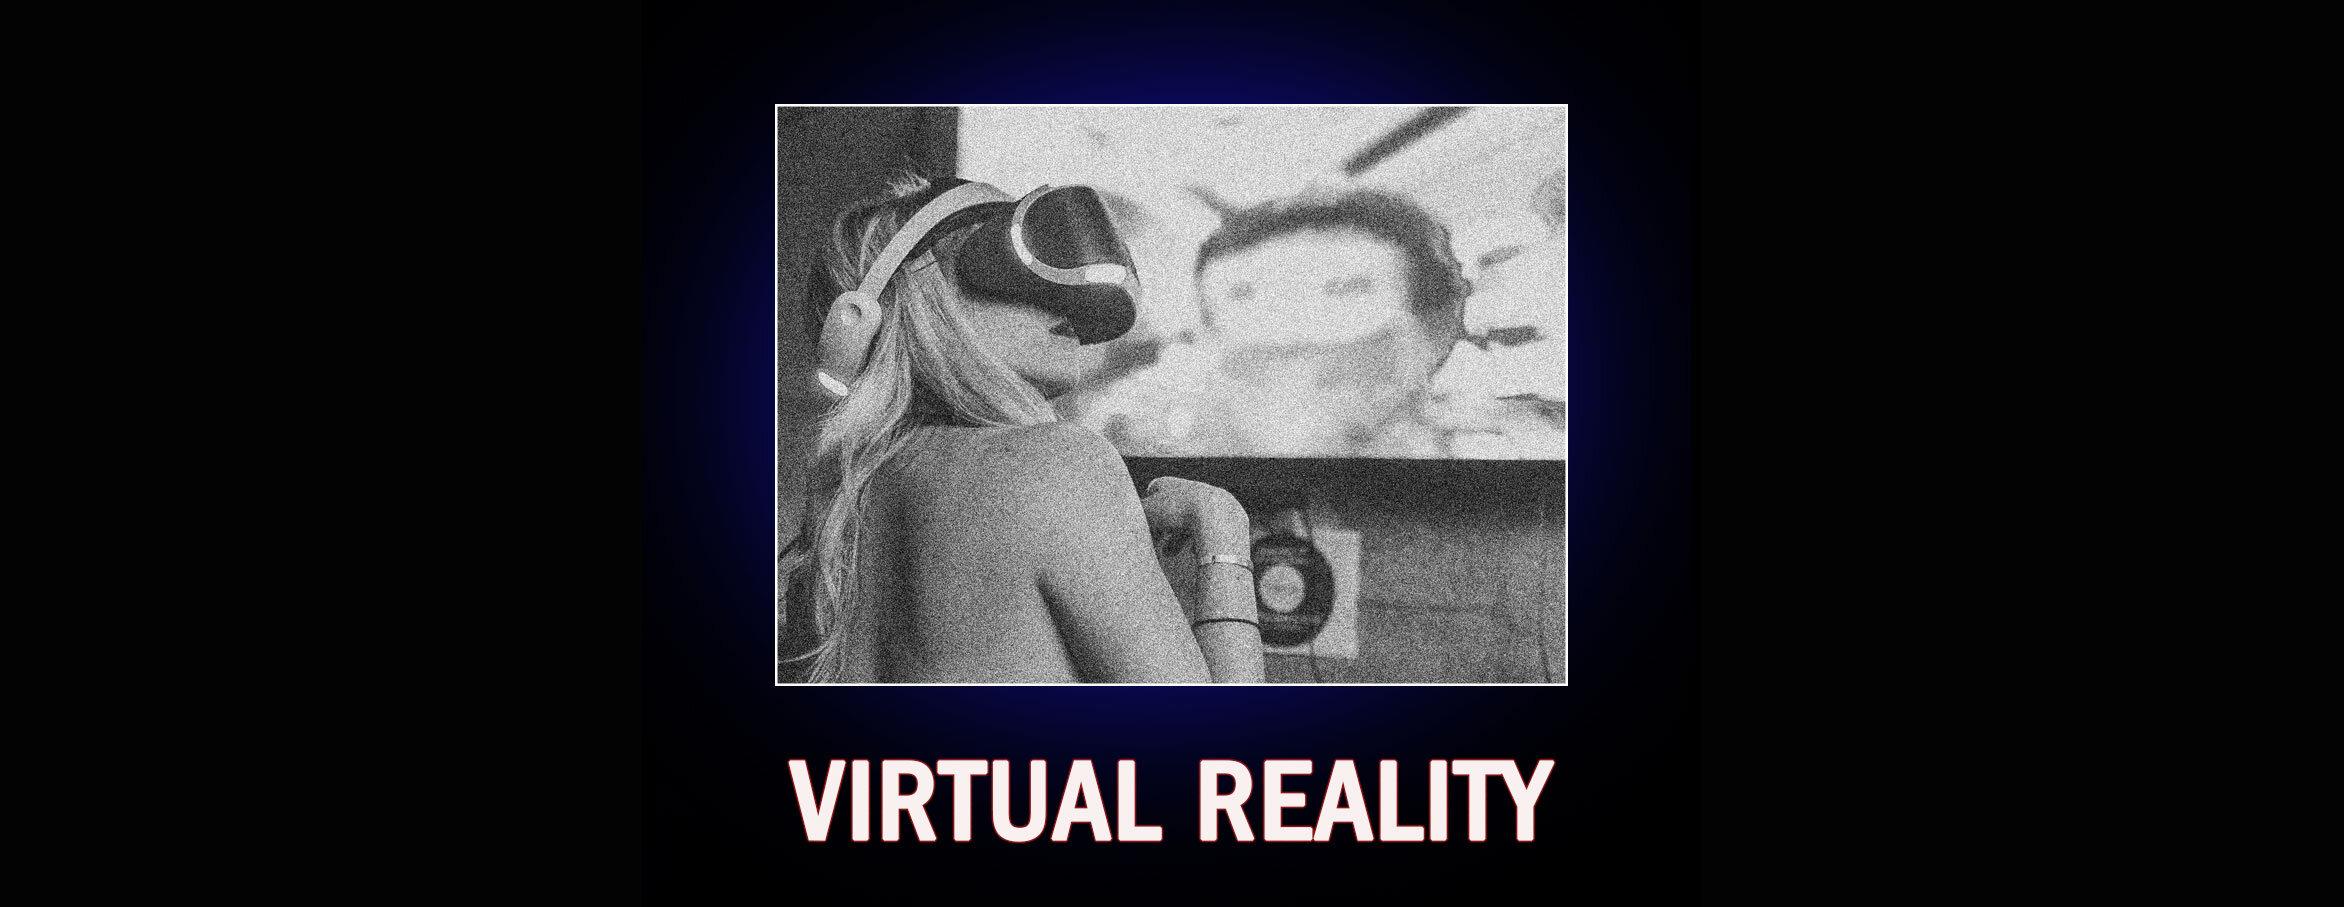 VIRTUAL-REALITY-BANNER.jpg